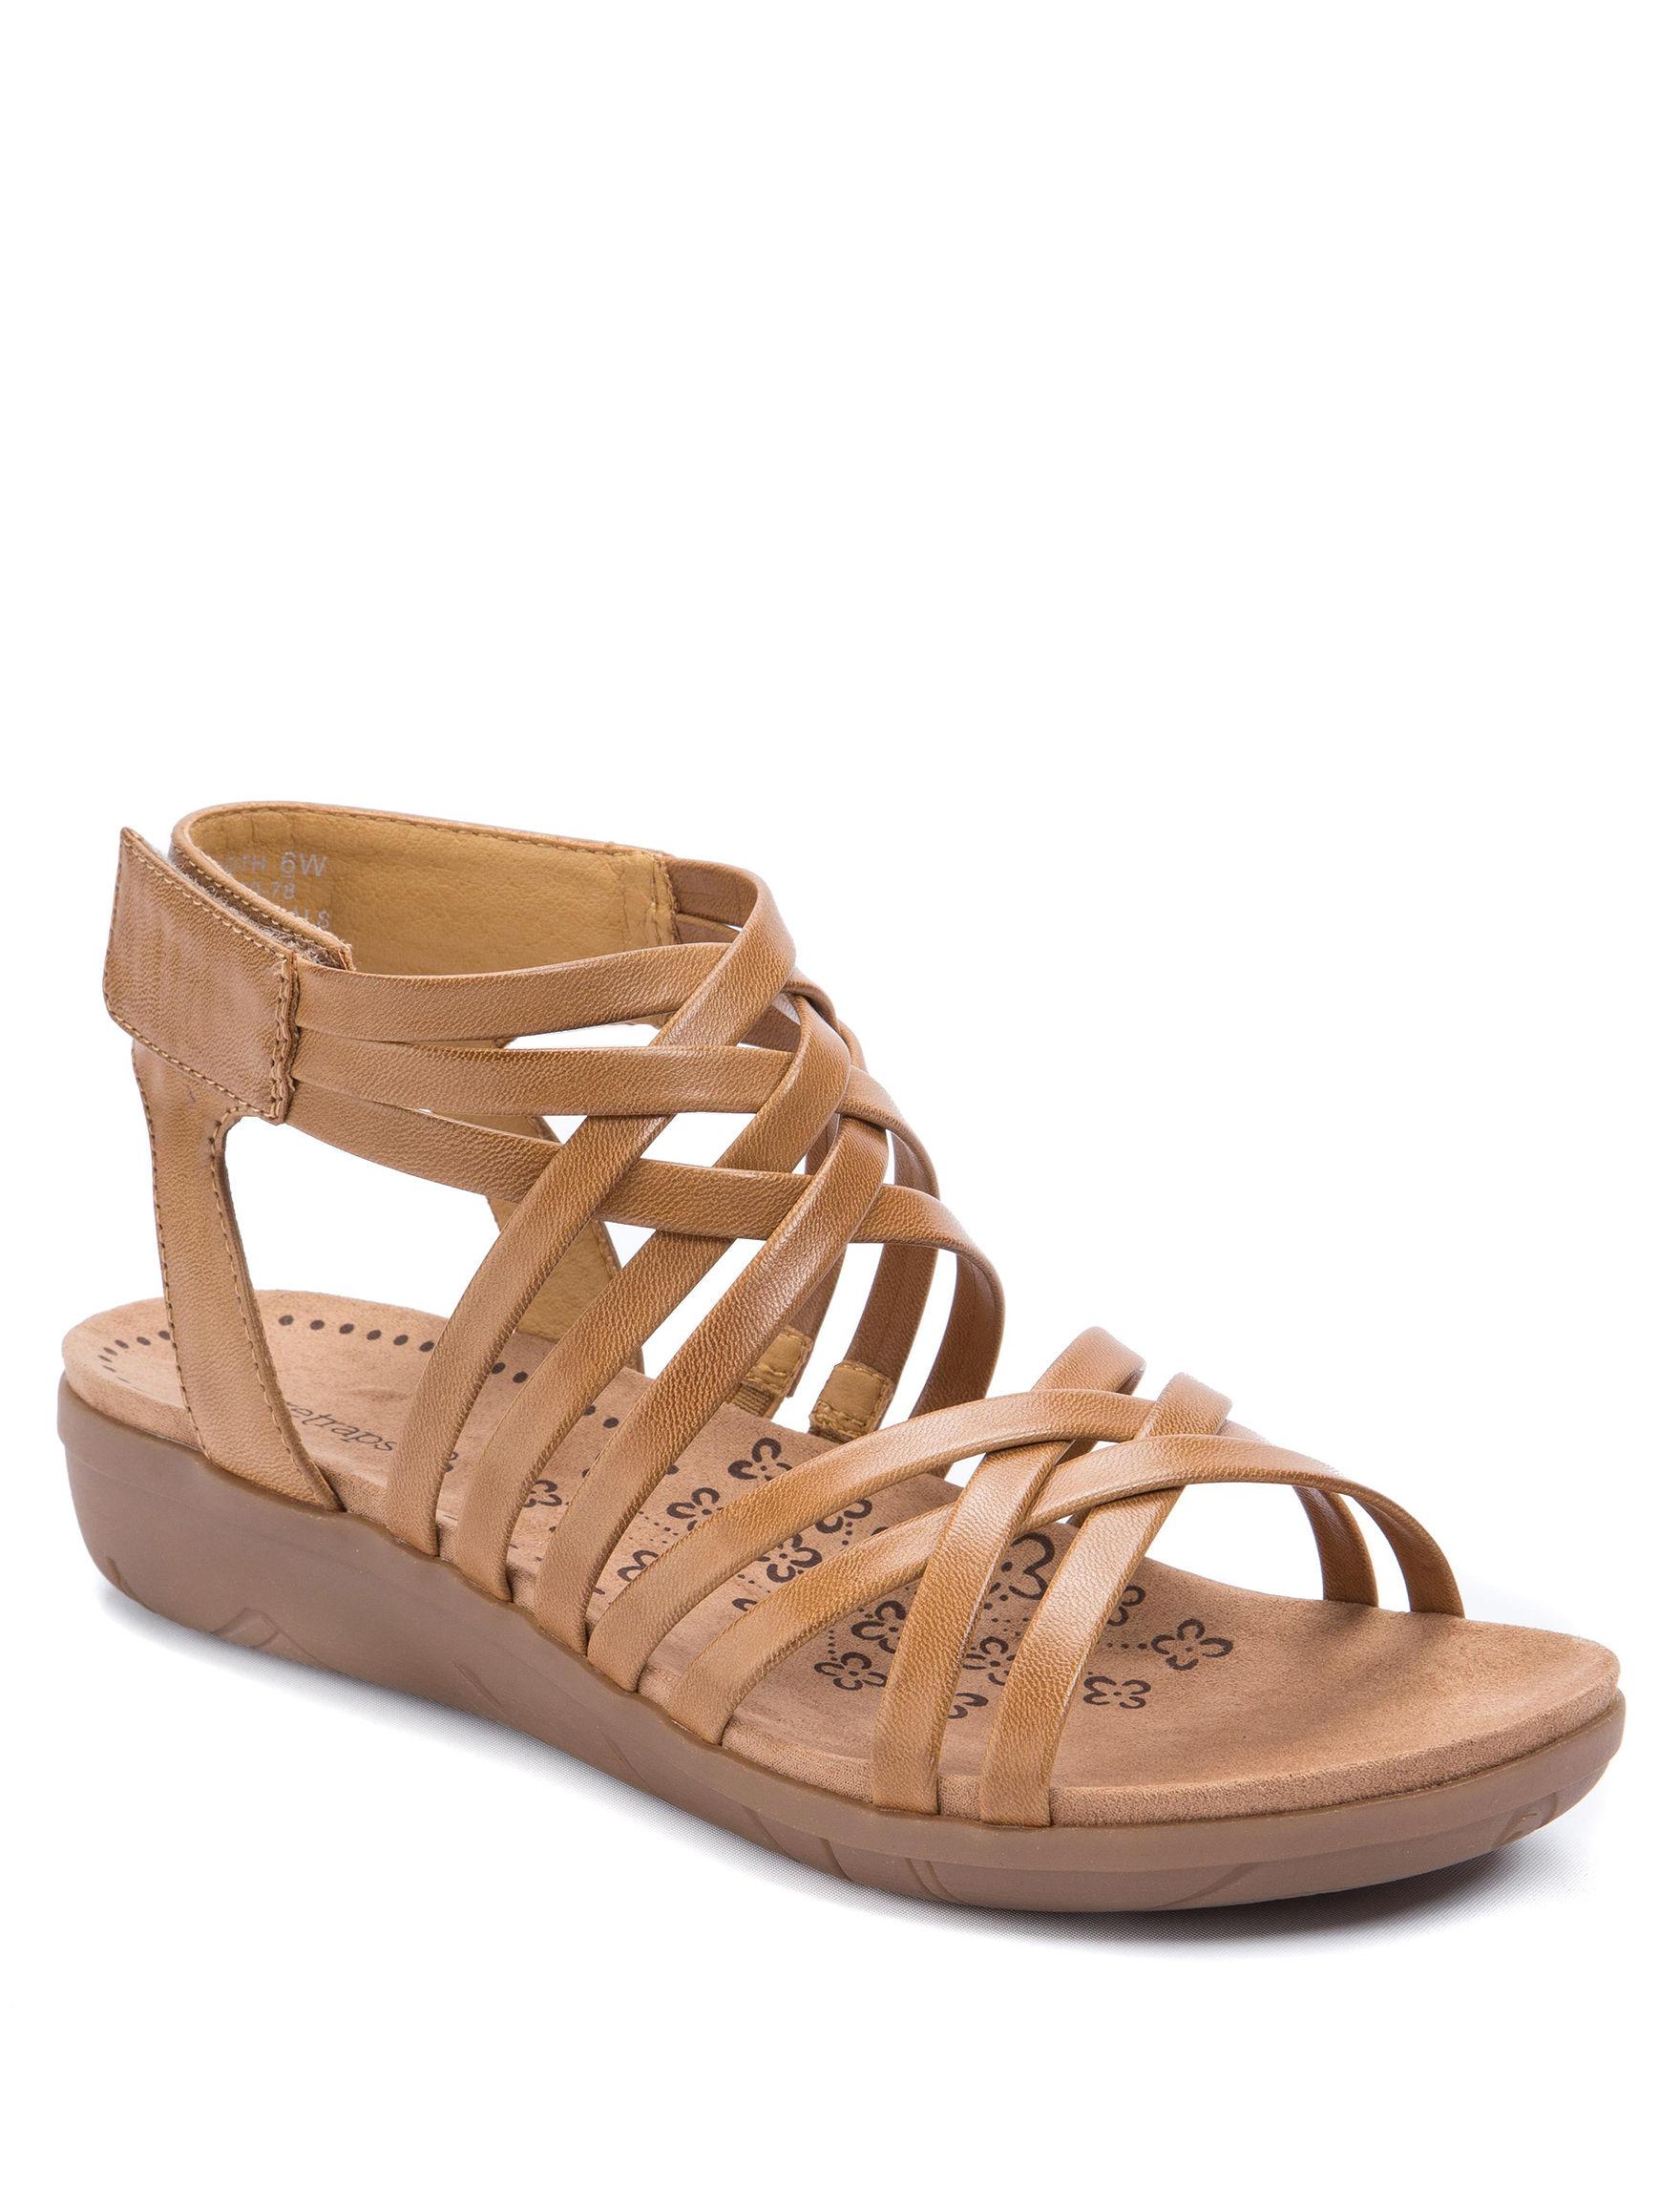 Bare Traps Caramel Flat Sandals Gladiators Comfort